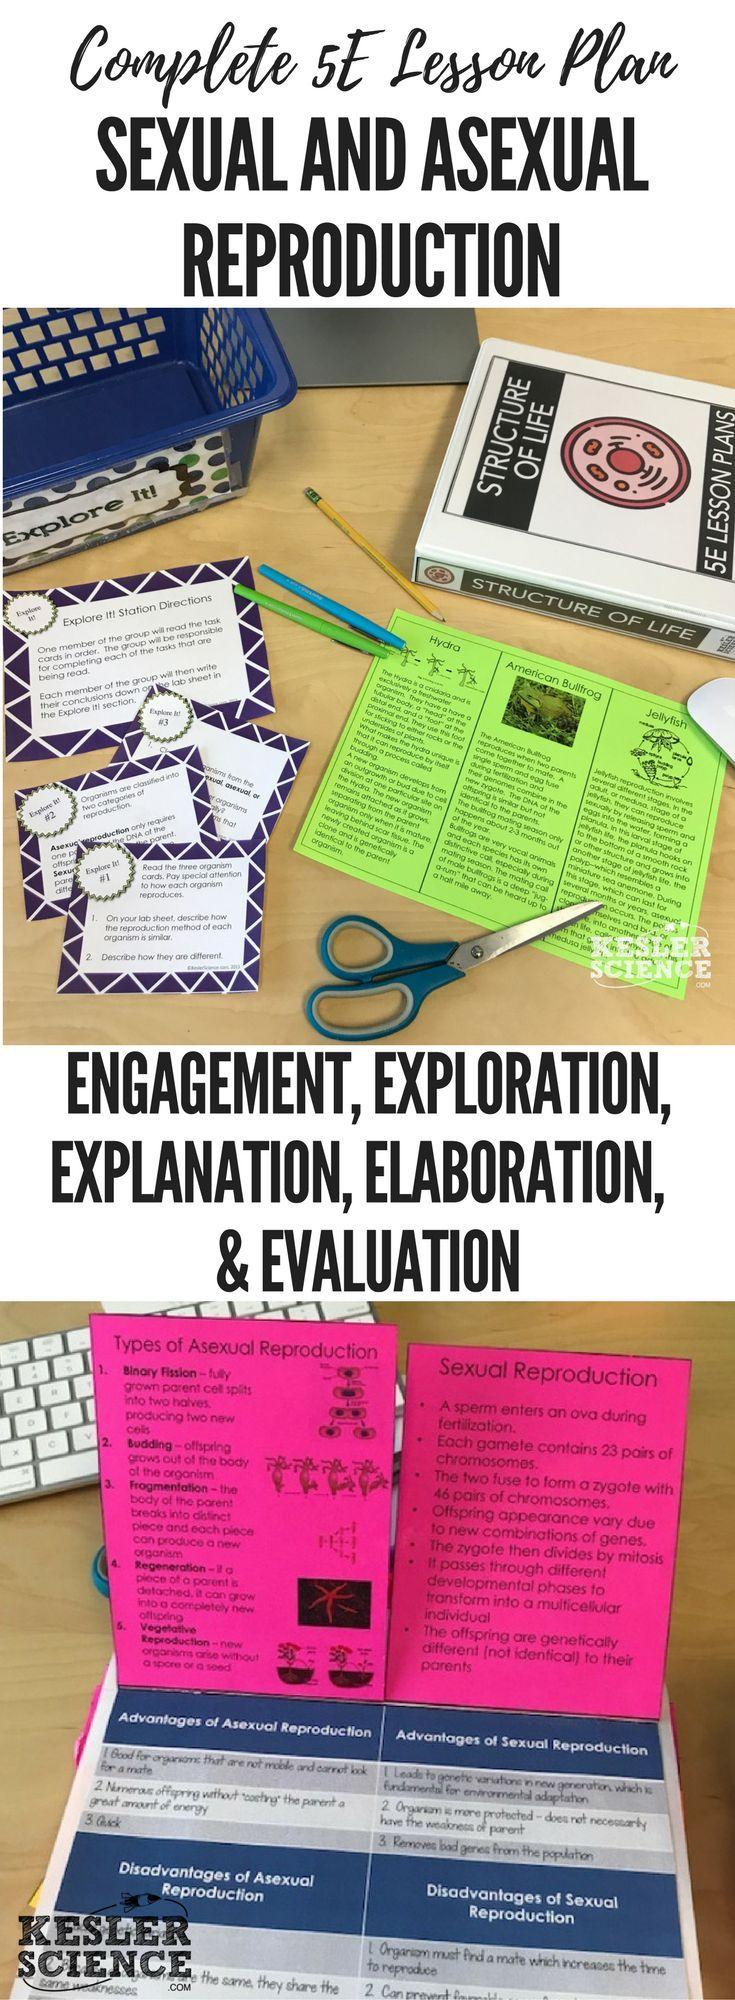 worksheet Asexual Reproduction Worksheet Middle School sexual and asexual reproduction 5e lesson plan science notebooks plan